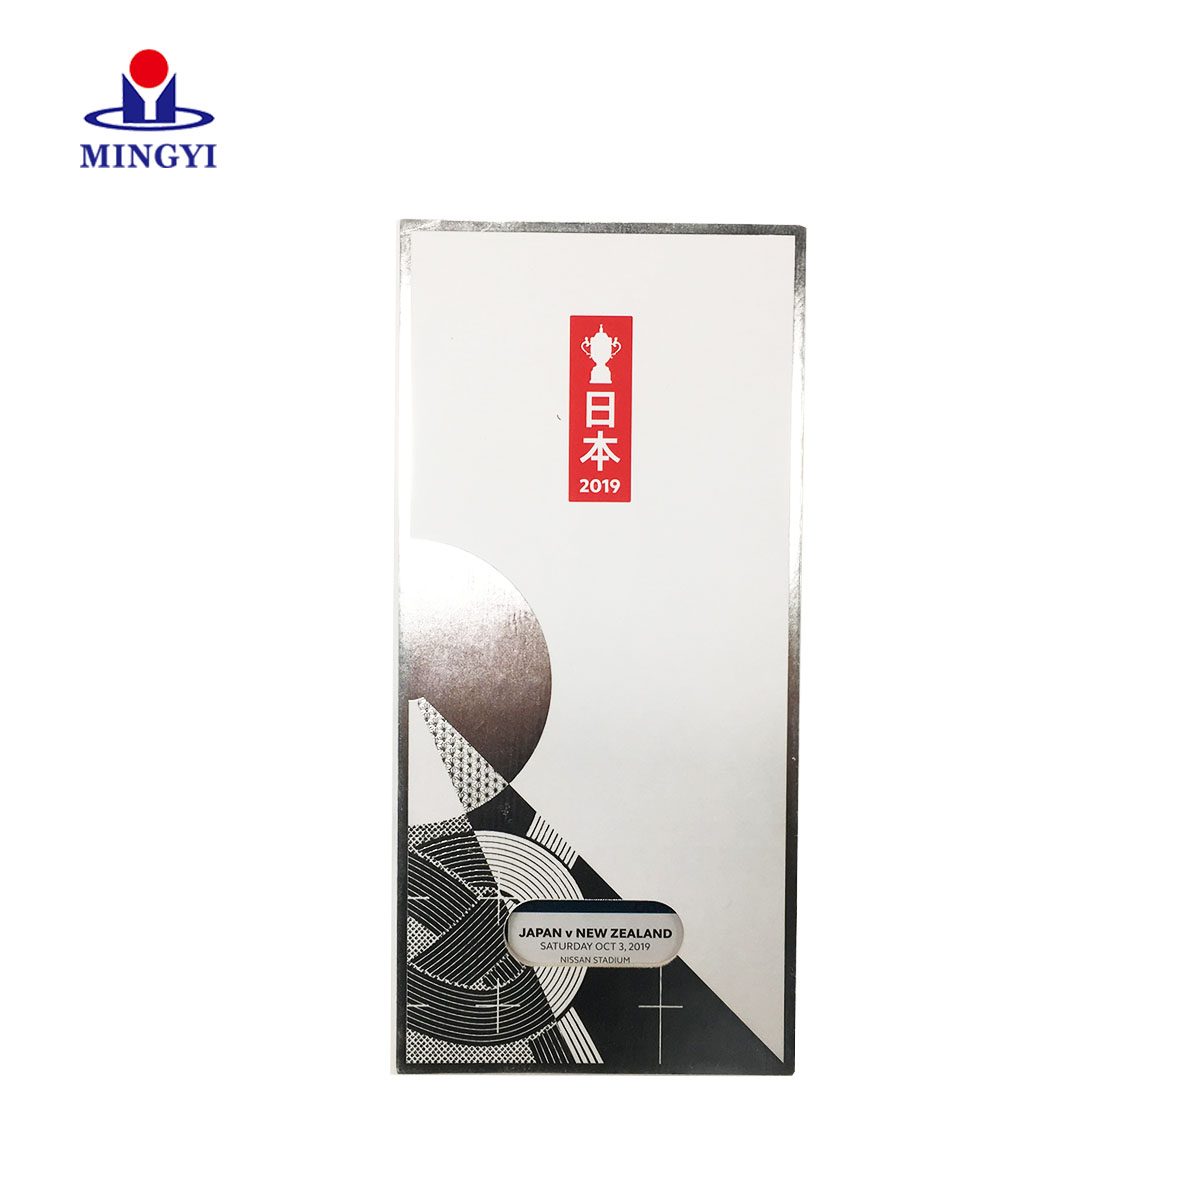 Mingyi Printing Array image115